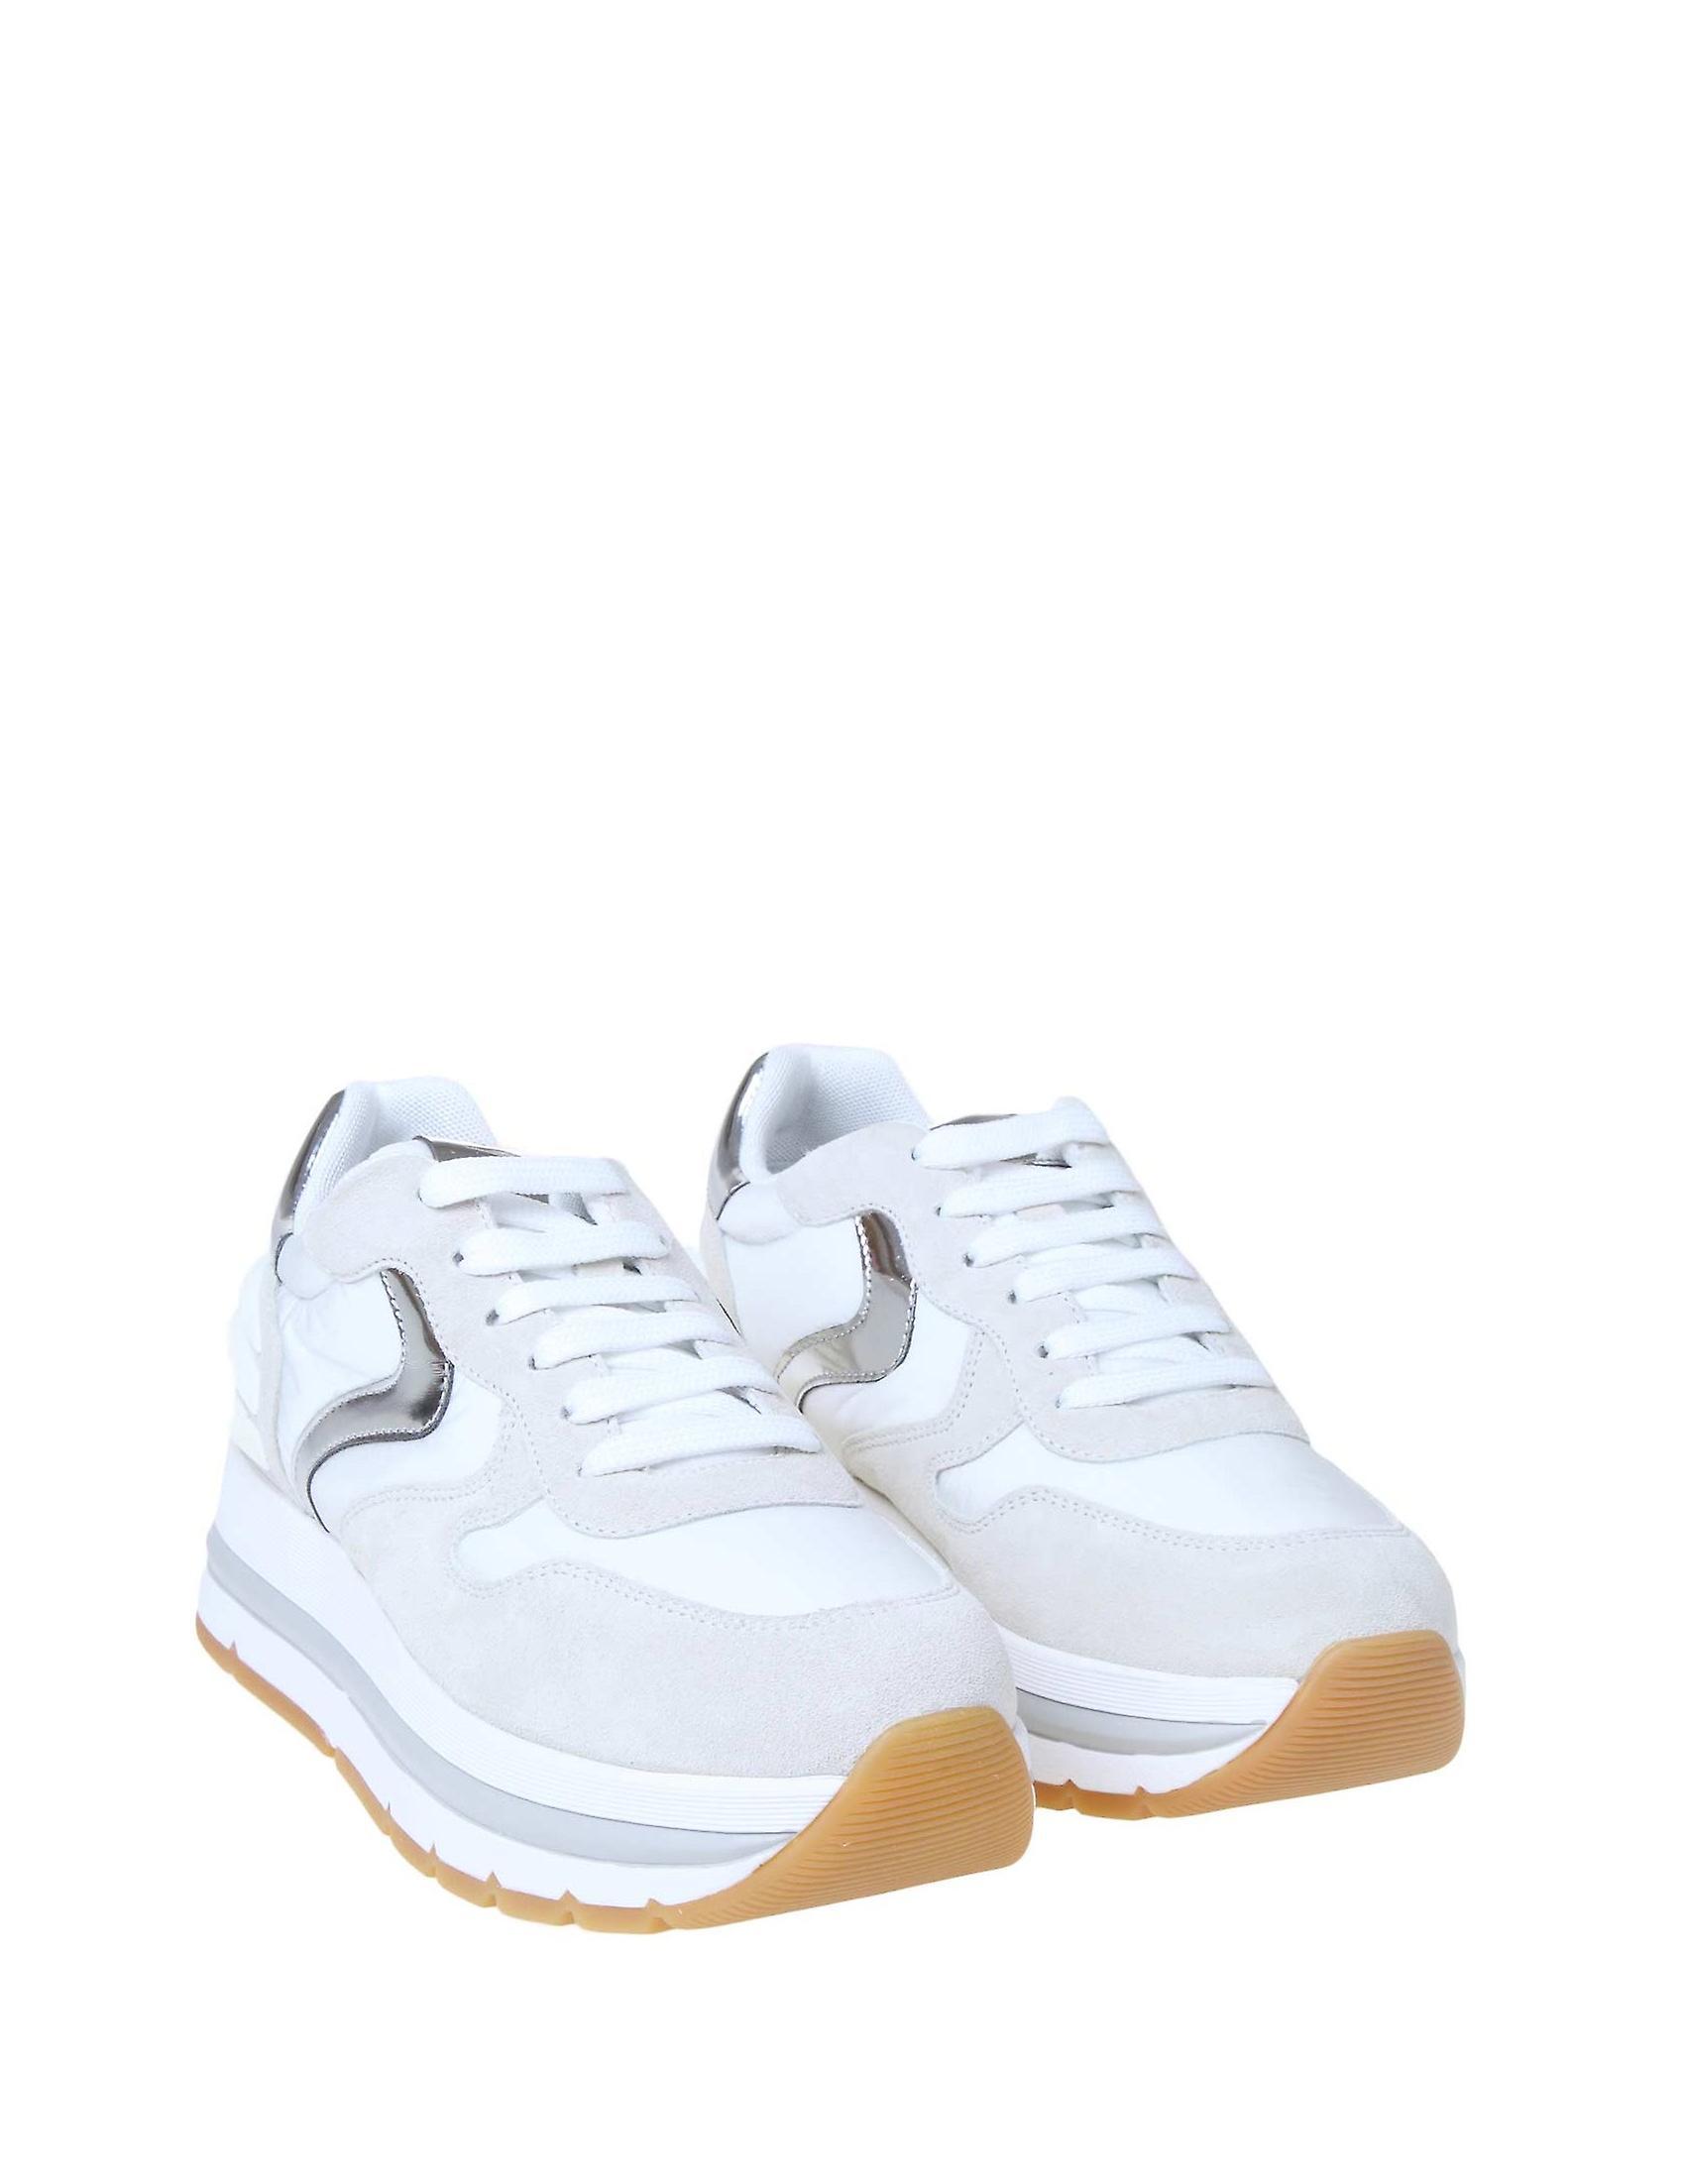 Voile Blanche 1e05001201475106 Damen's Weiße Stoff Sneakers